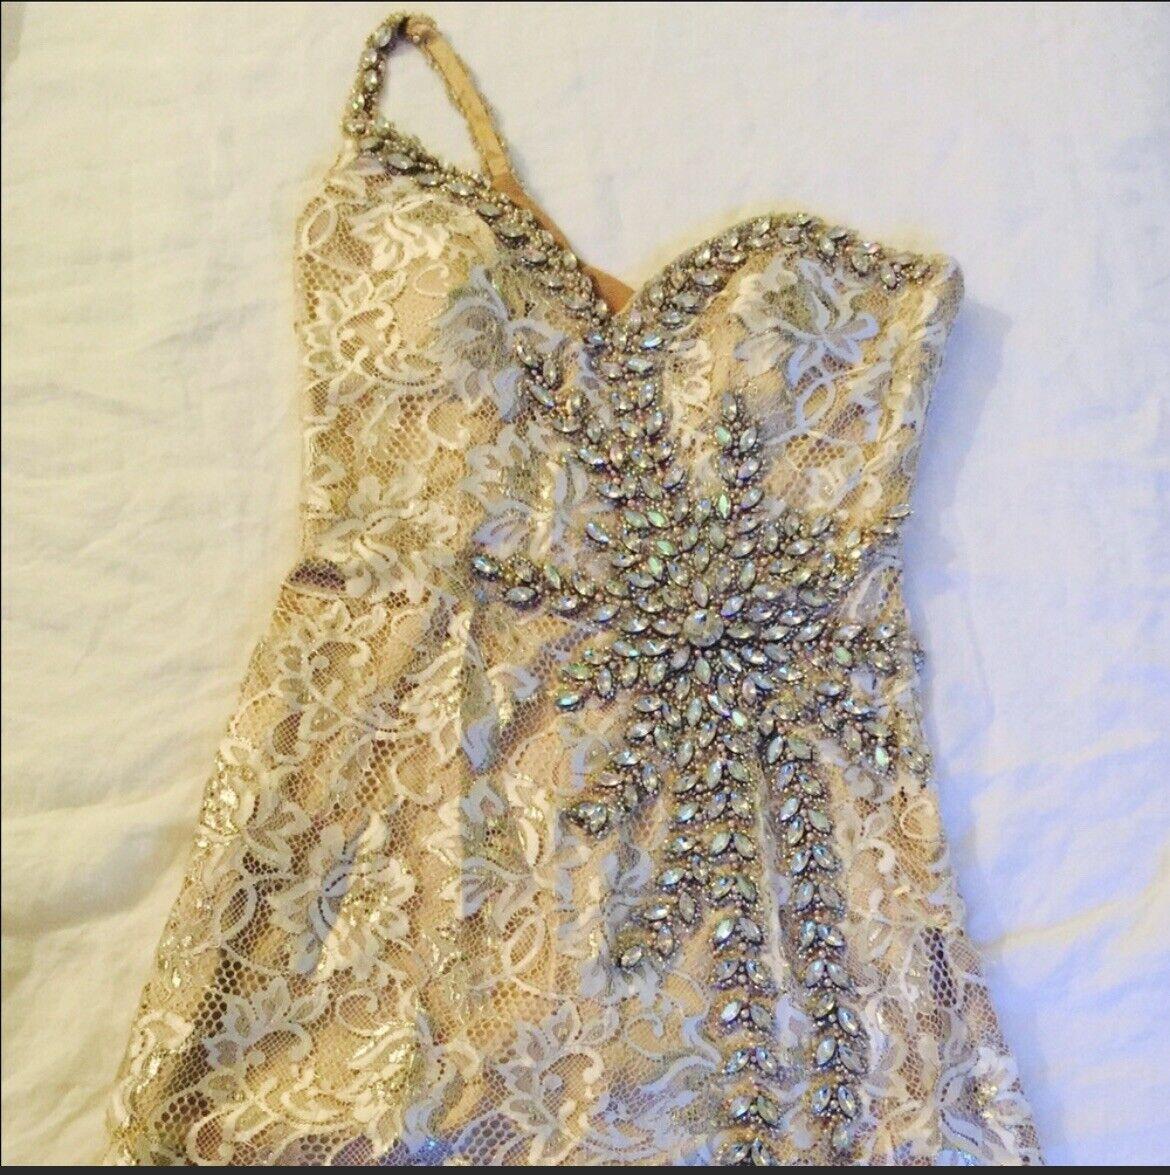 Terrani Couture Crystal Nude Dress Wedding Formal - image 5